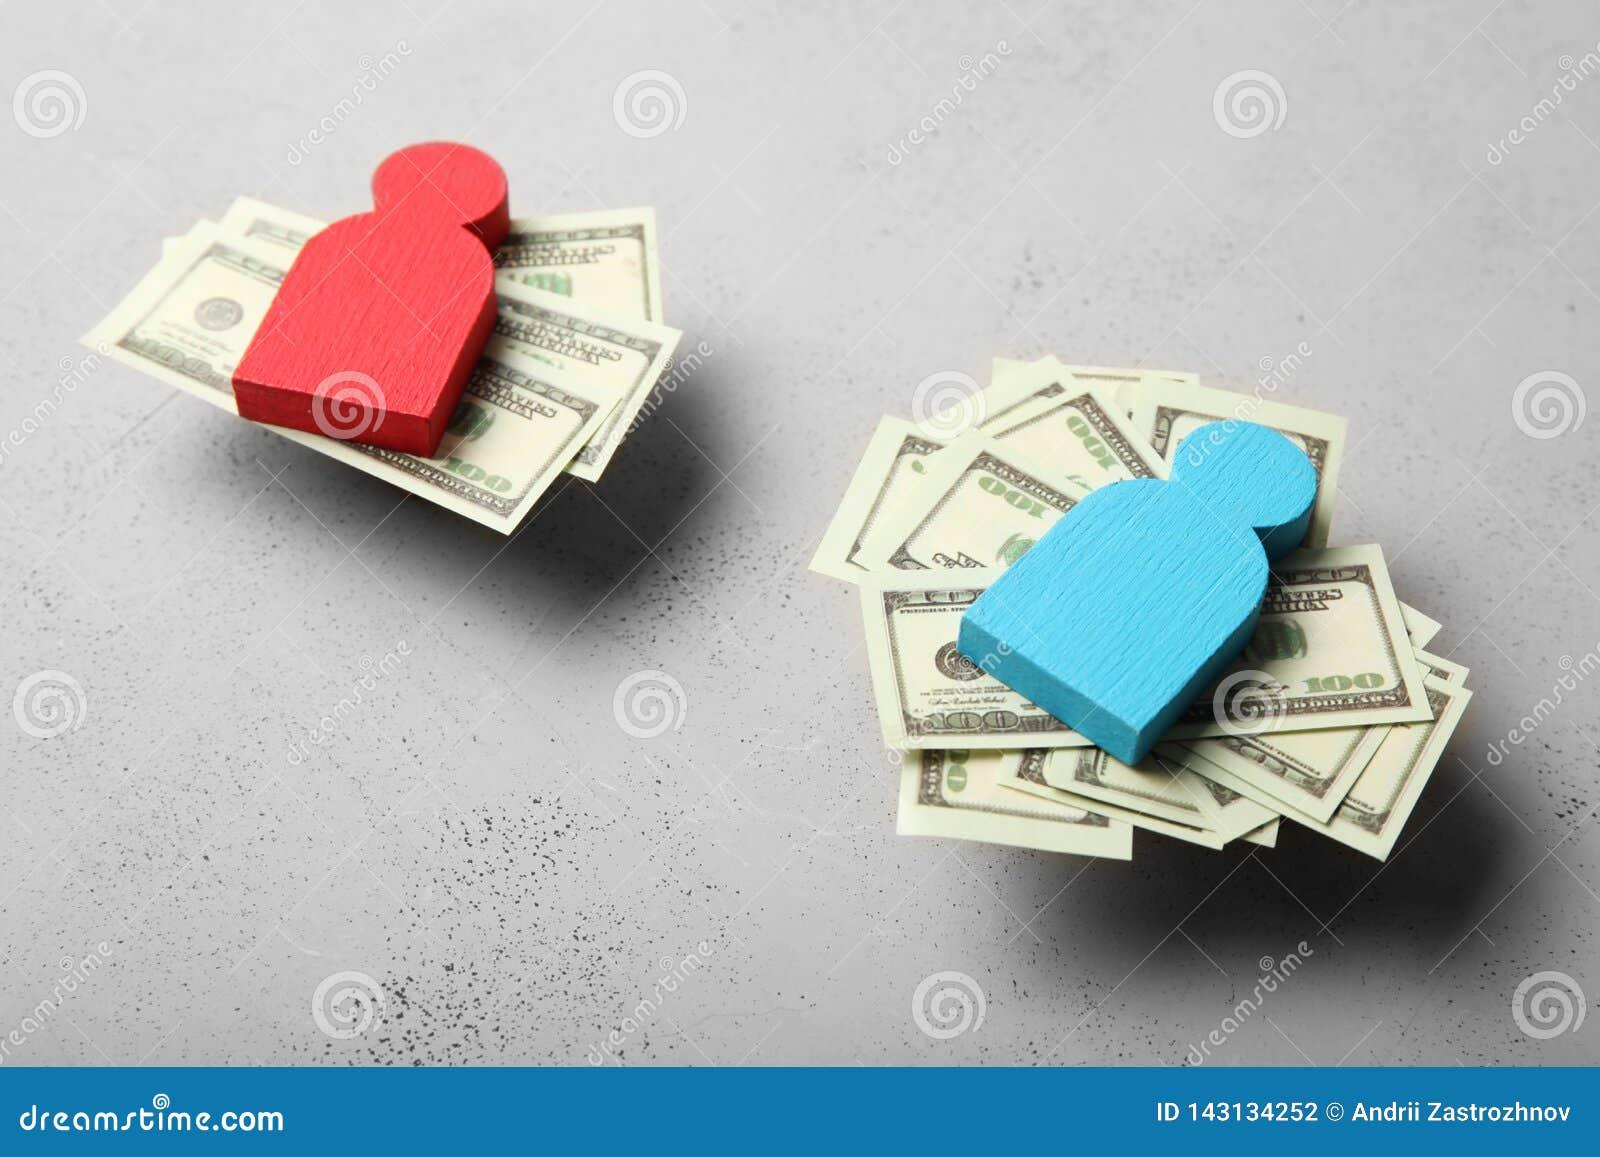 Genusojämlikhet i nivå av lönbegreppet